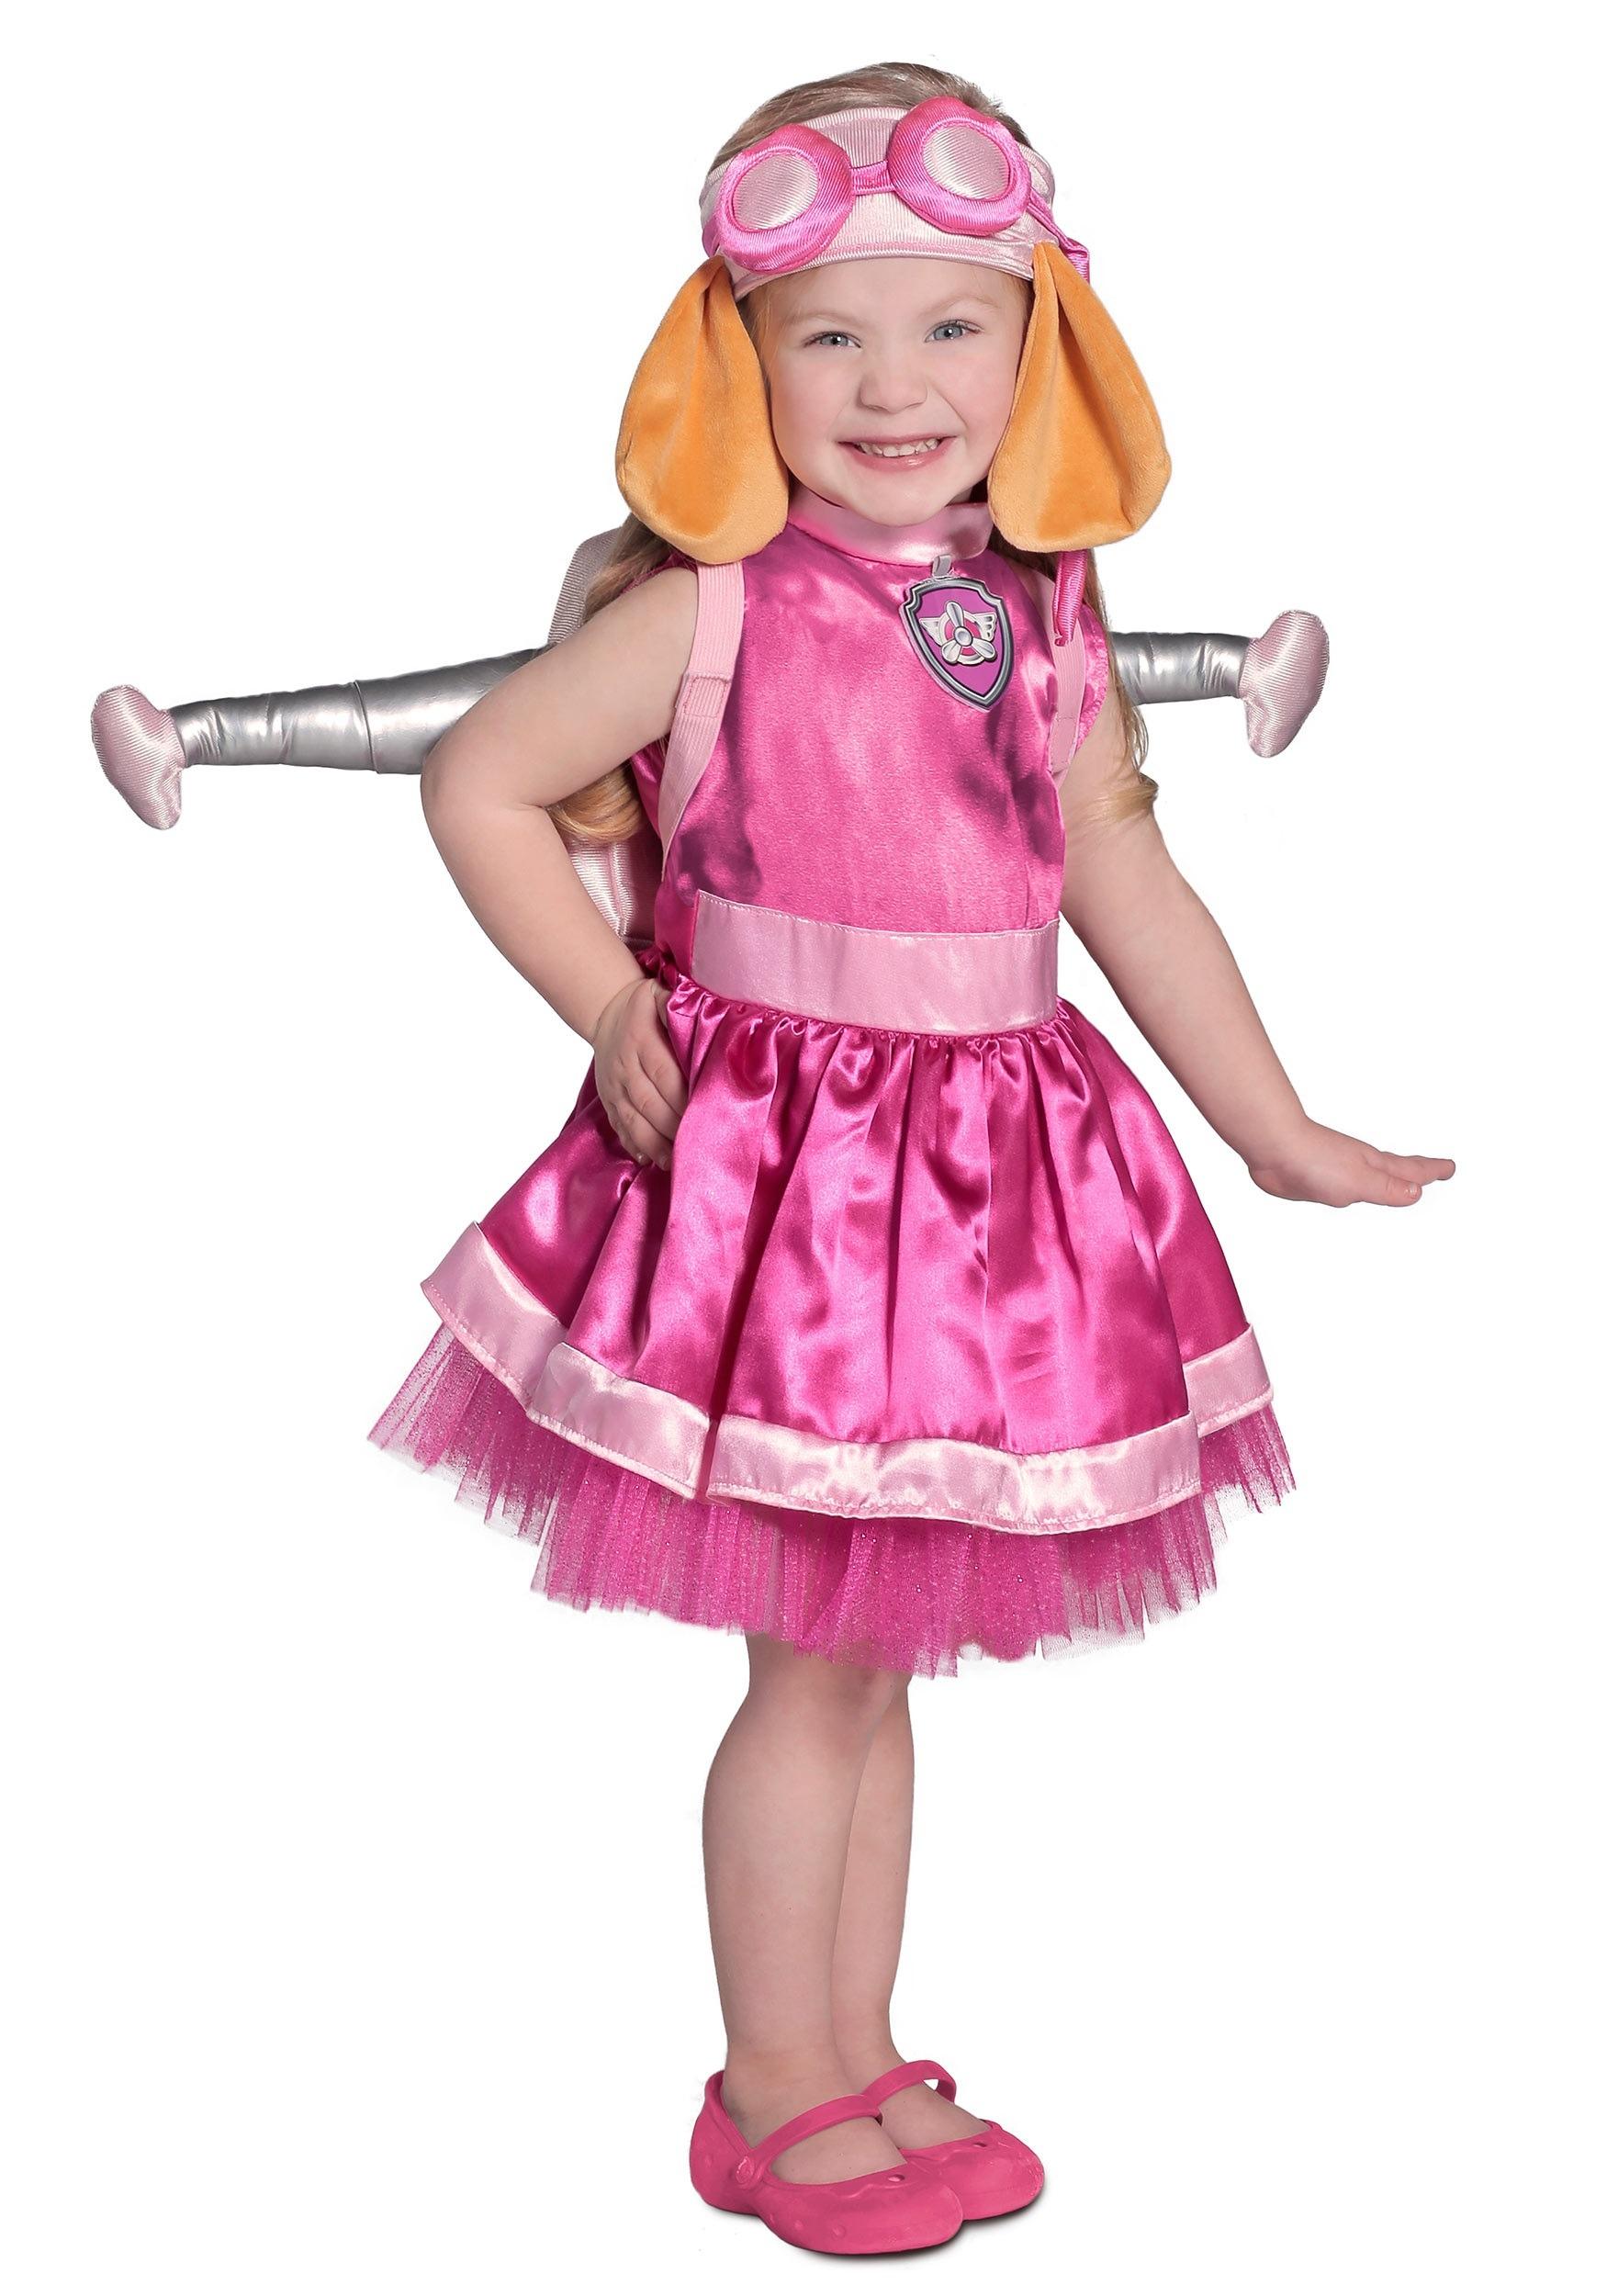 Nickelodeon Paw Patrol Skye Child Costume Girls Toddler Helicopter Cockapoo Dog